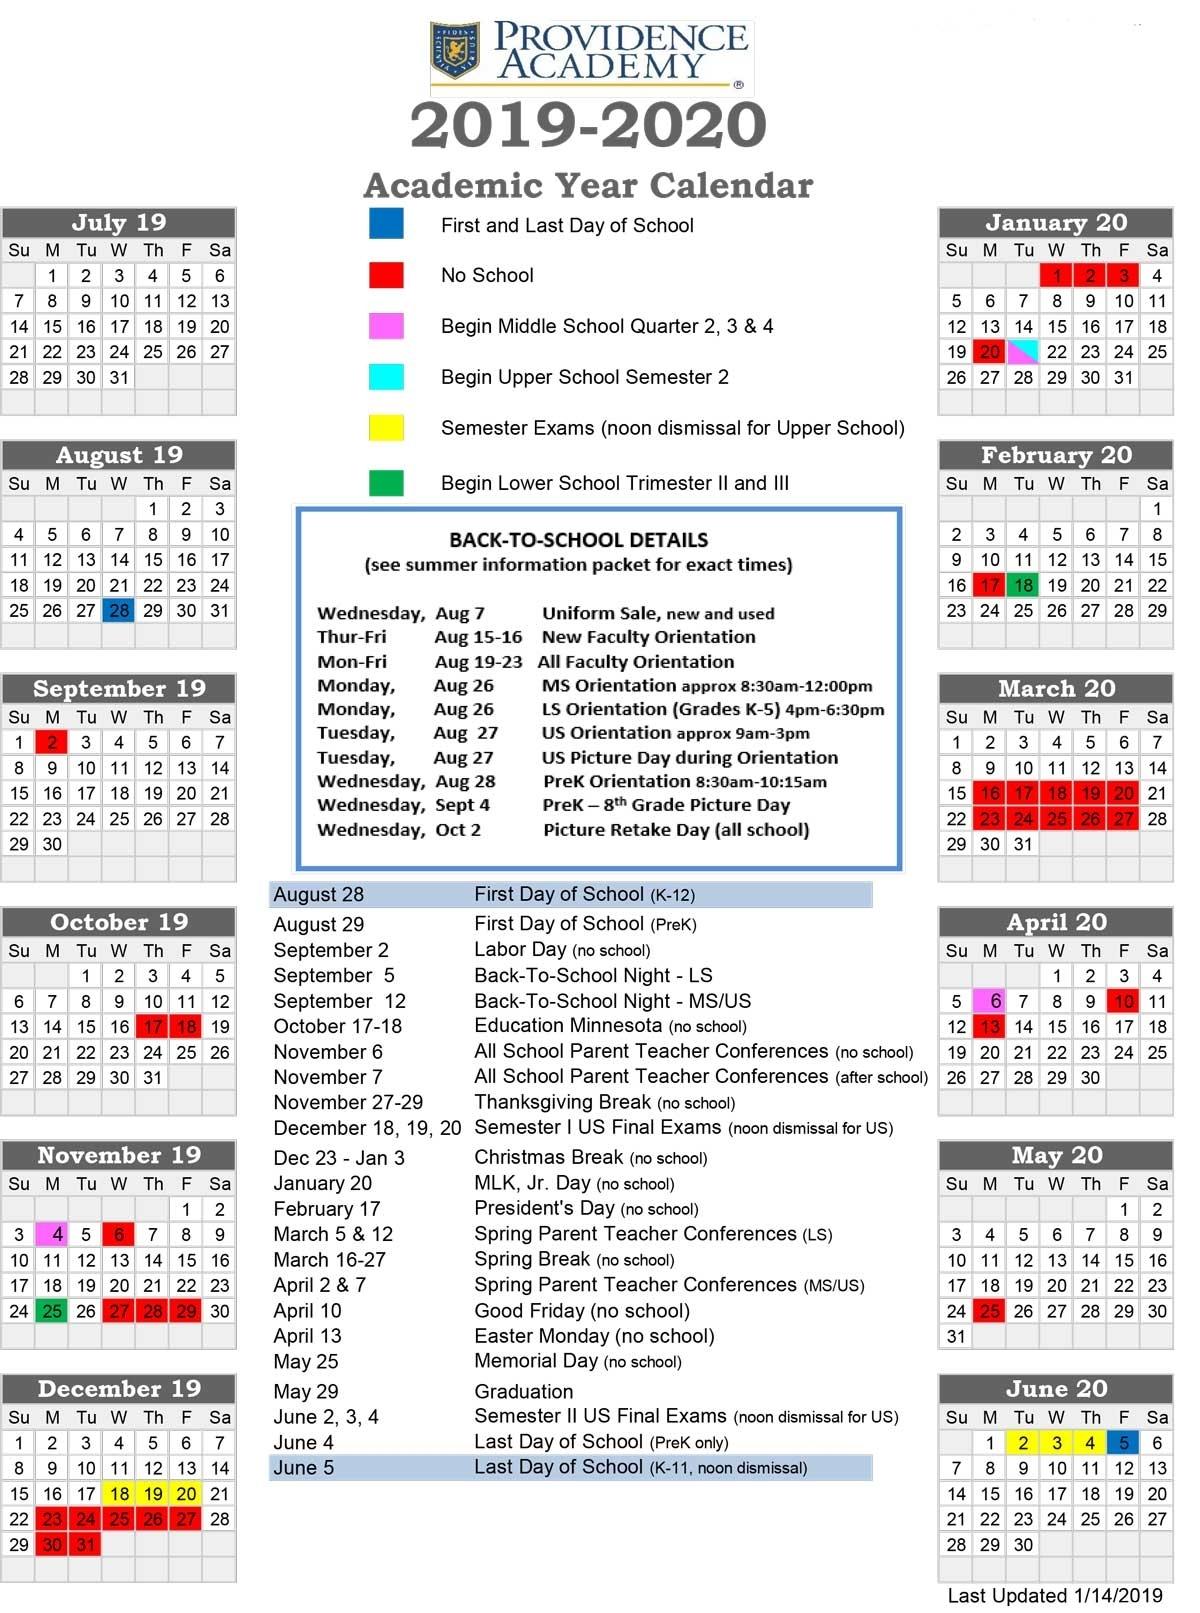 Academic Calendar - Providence Academy regarding U Of M Calander 2019-2020